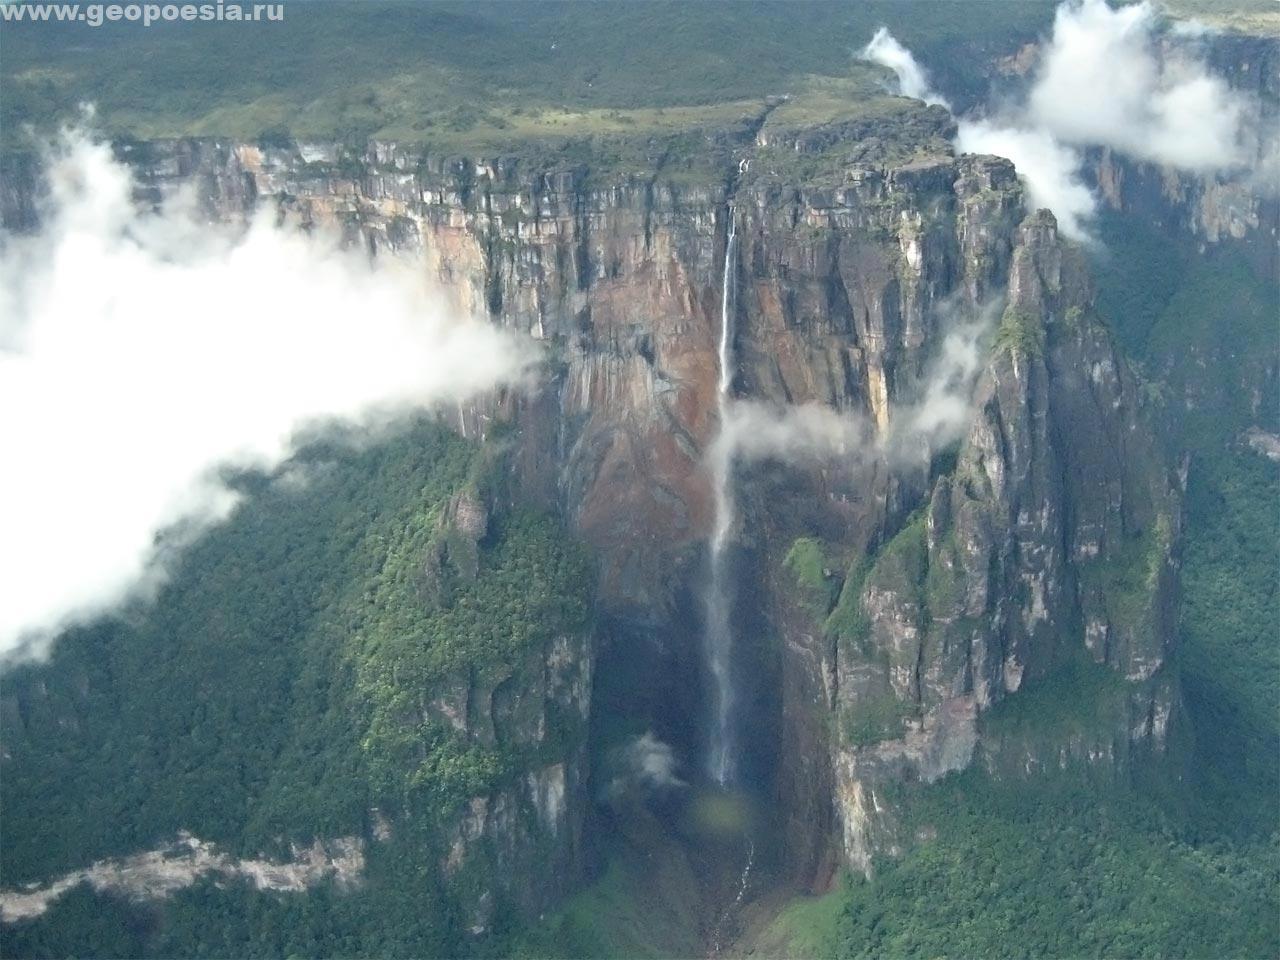 Фото водопада Анхель с самолёта: http://www.geopoesia.ru/ru/foto/venezuela/plato/poem28/foto276.html